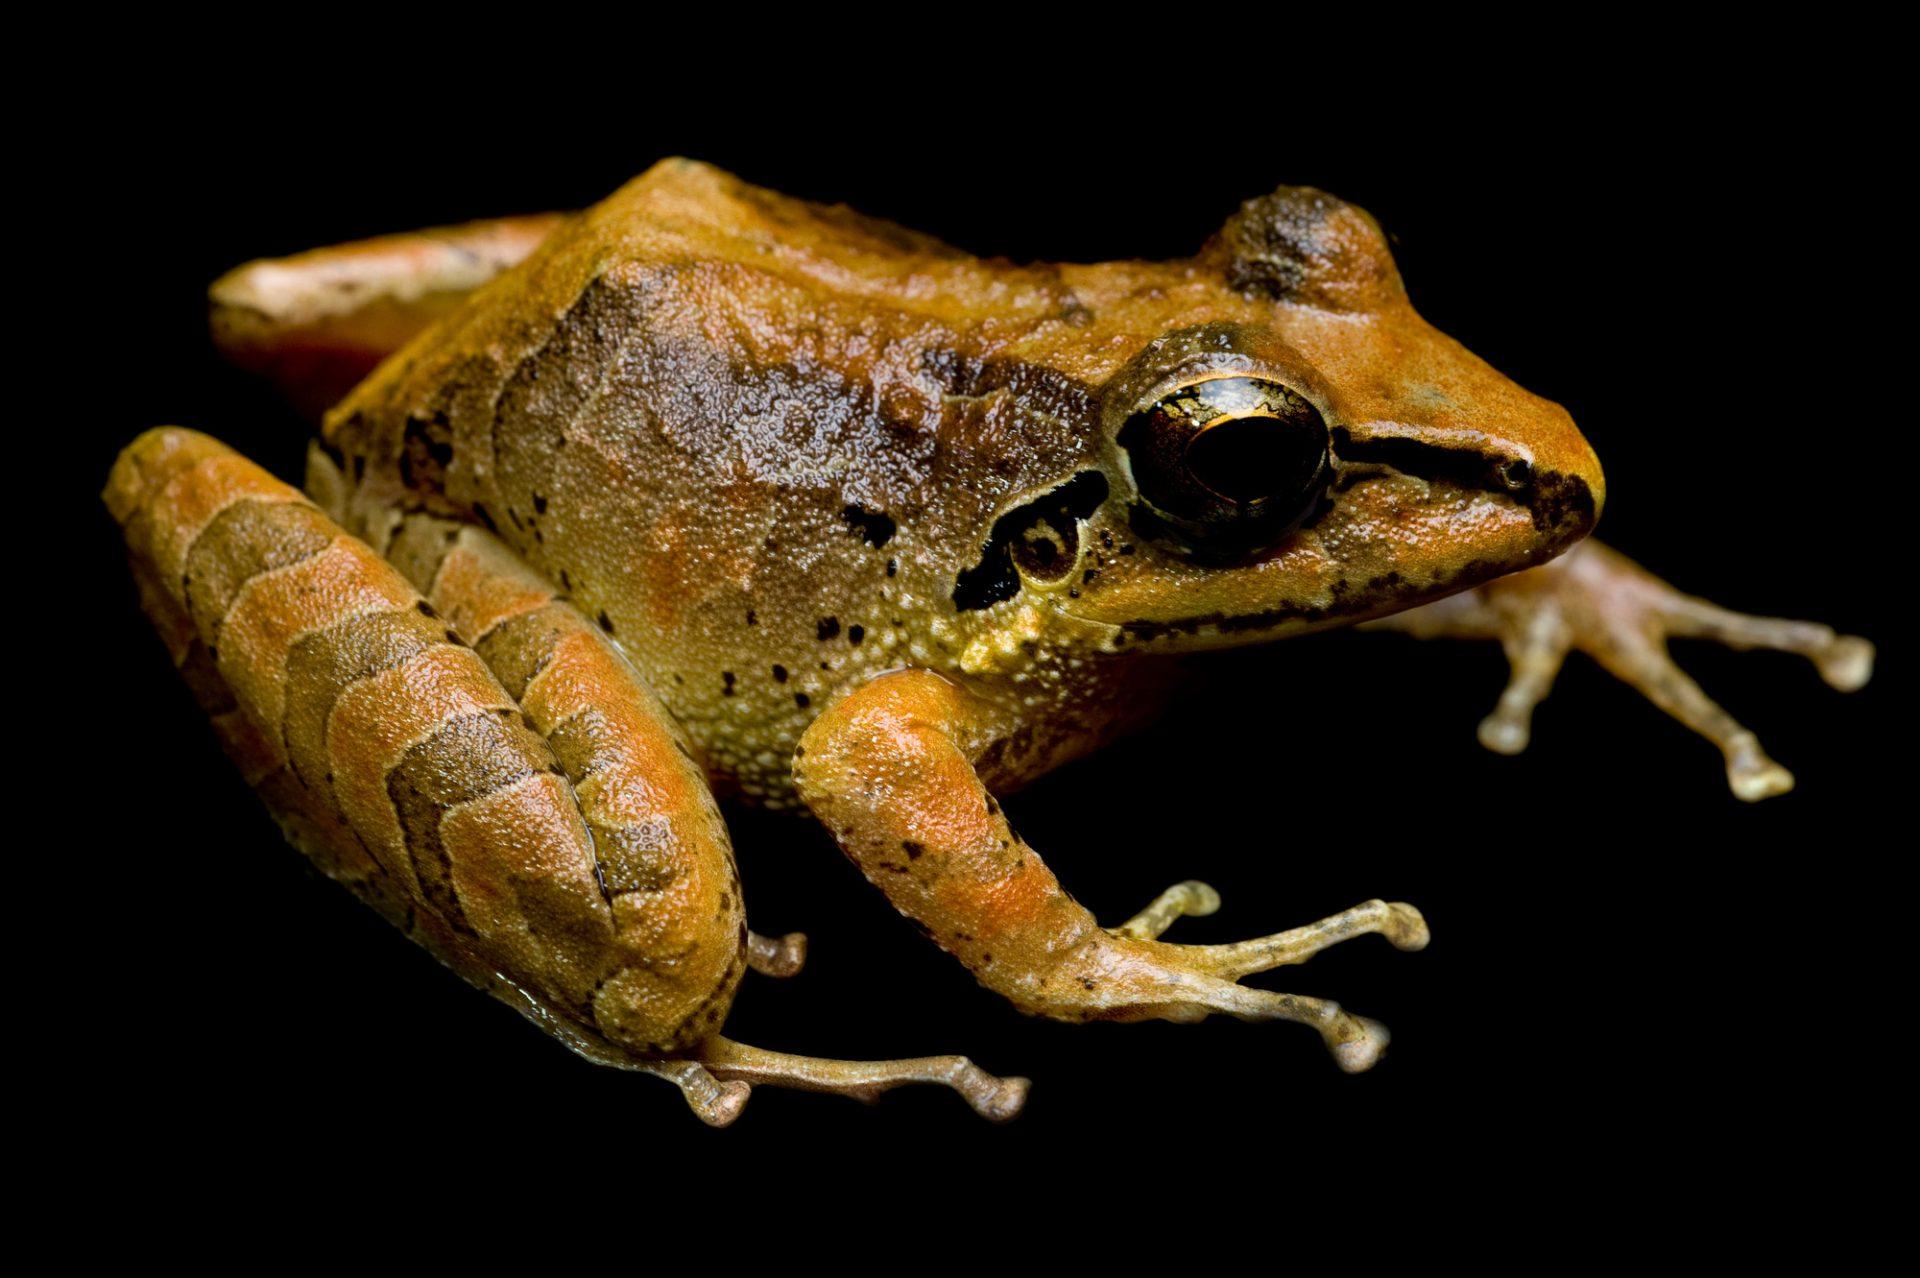 A Zurucuchu robber frog (Pristimantis w-nigrum) near Mindo, Ecuador.